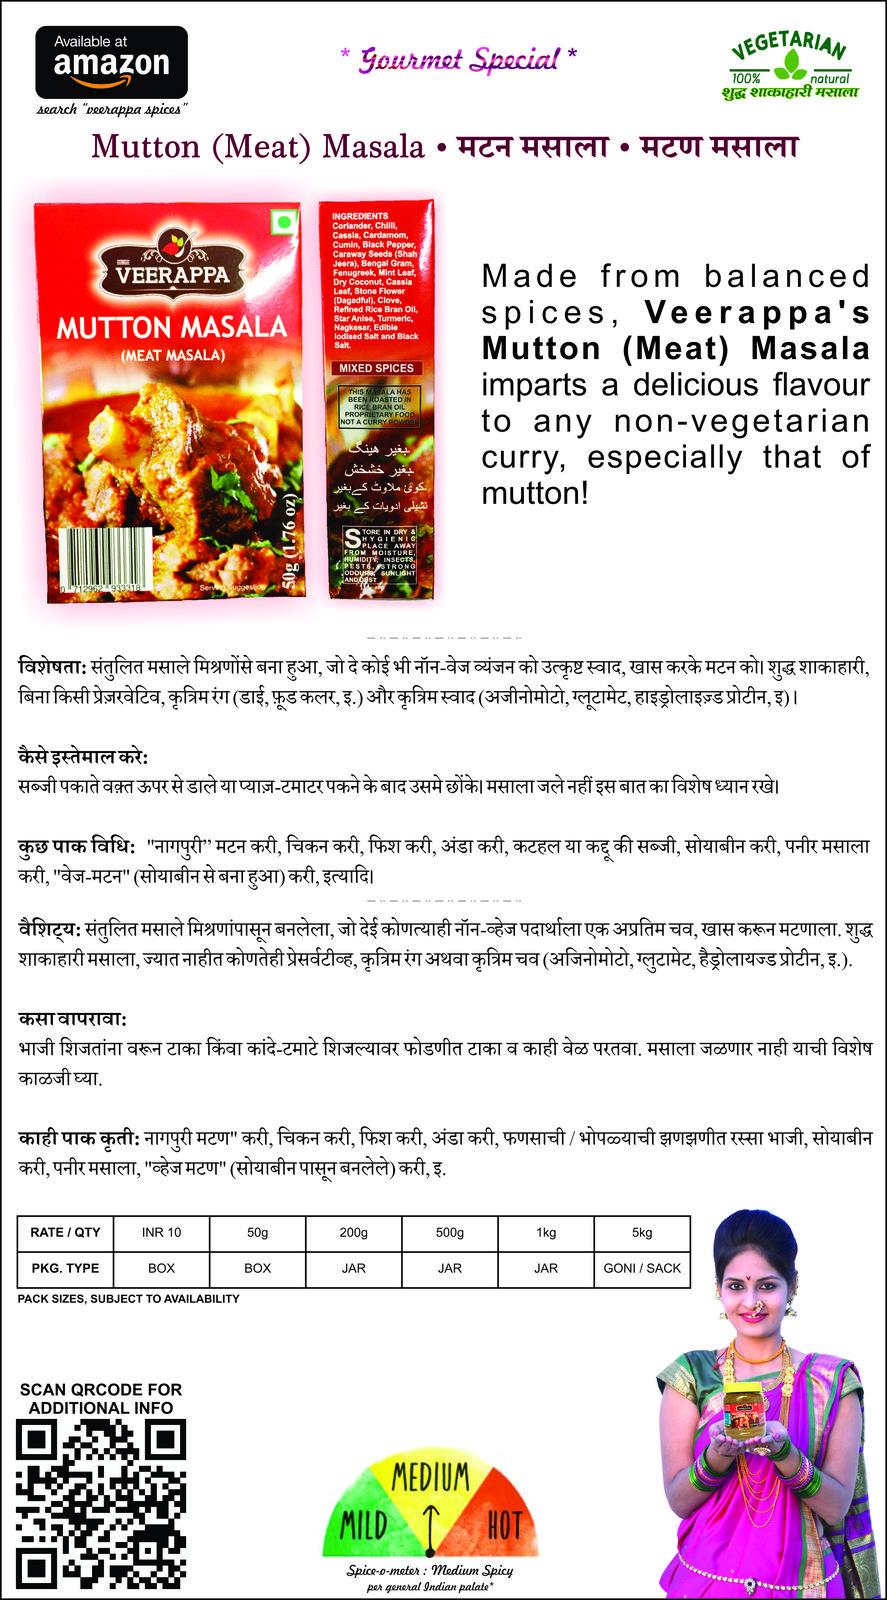 Dawat-e-khas Box (Pack of 4 assortments - Ghati, Shahi Biryani, Mutton, Varhadi)